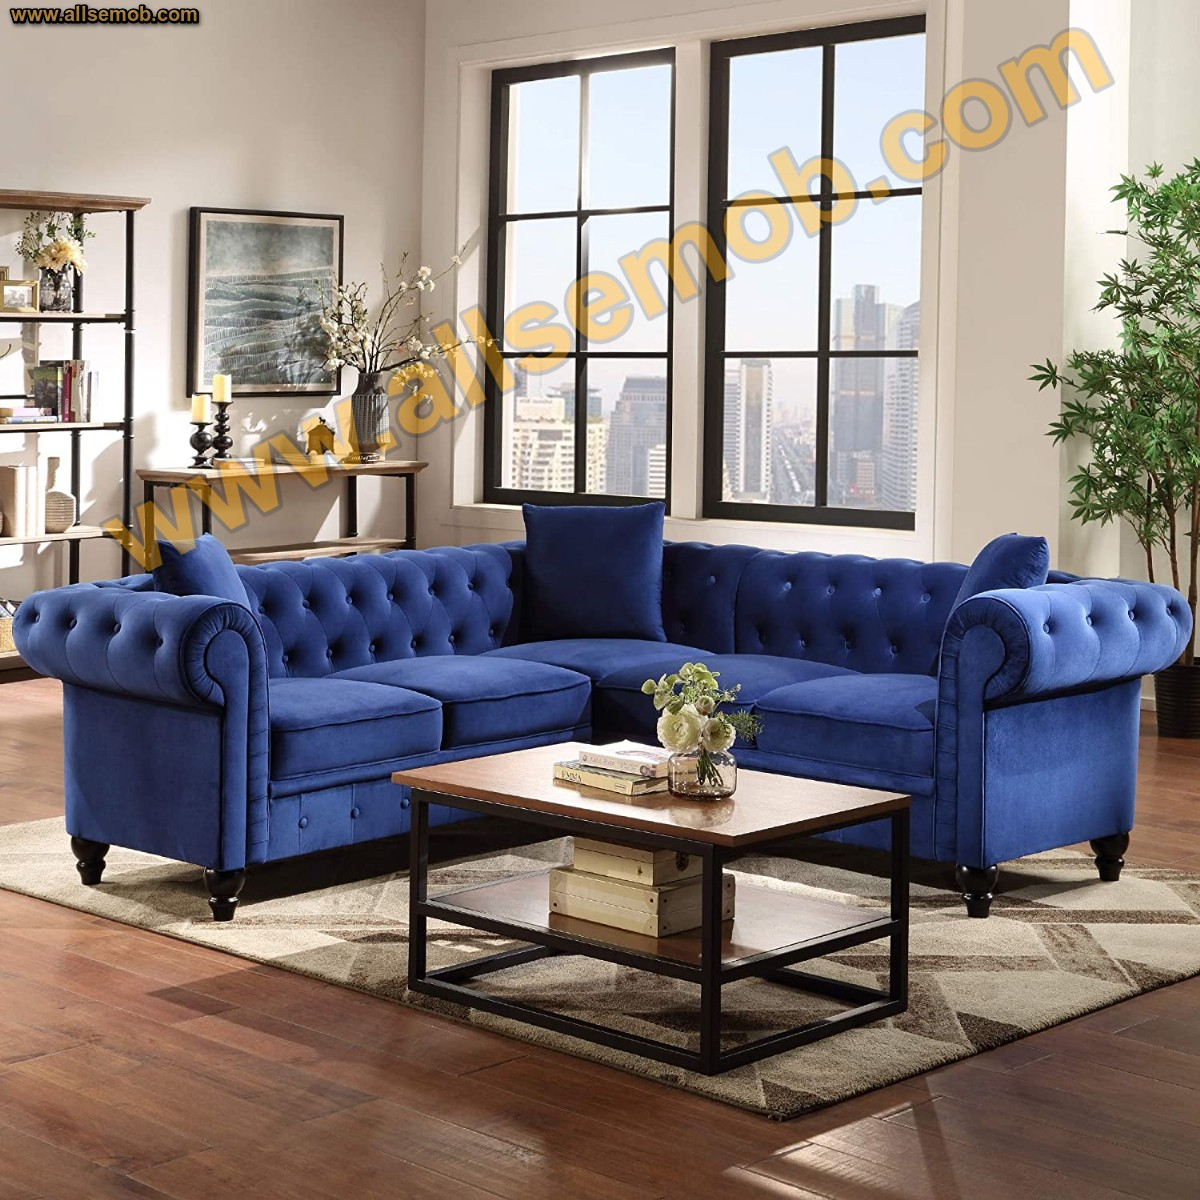 Mavi Chester L Köşe Takımı Klasik P Kol